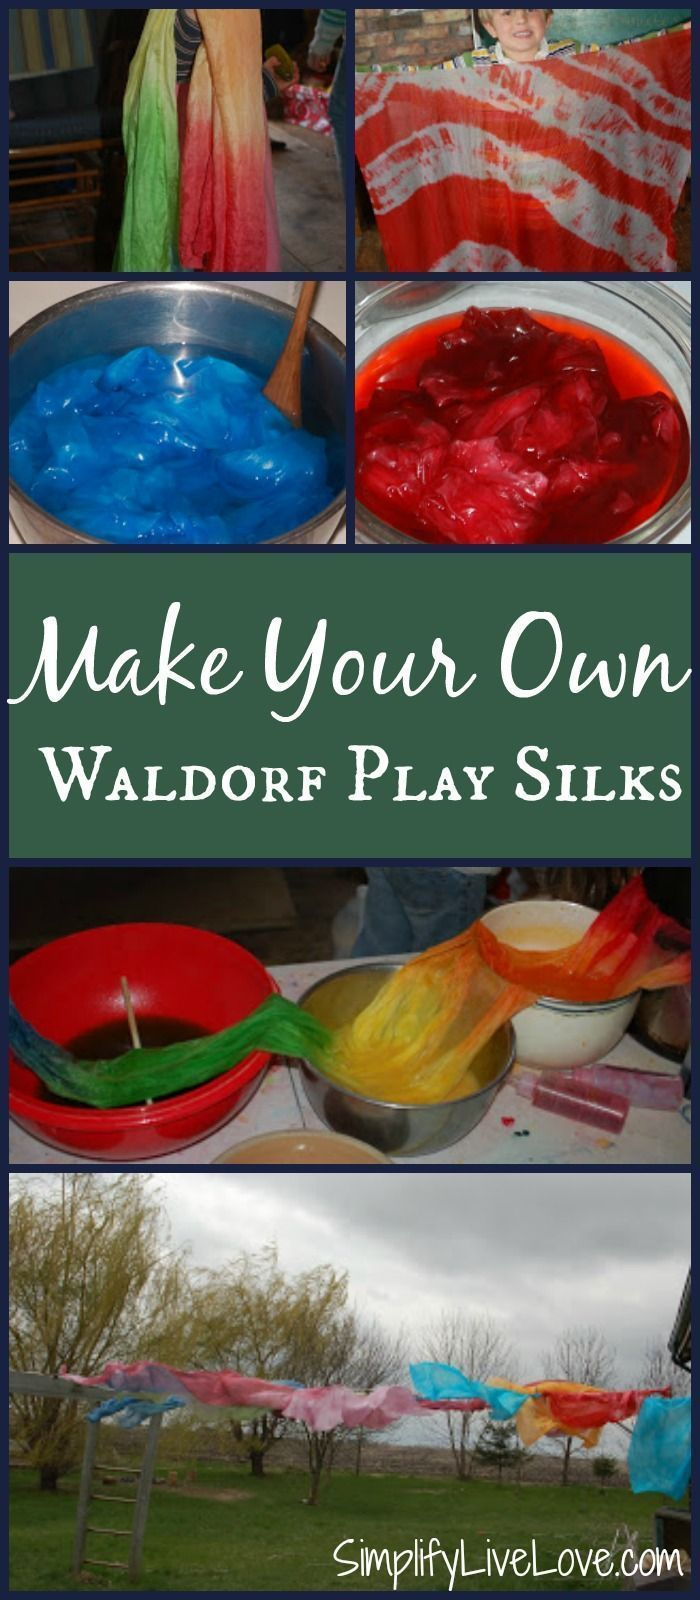 Make Your Own Waldorf Play Silks ~ A Tutorial Using Kool-Aid!